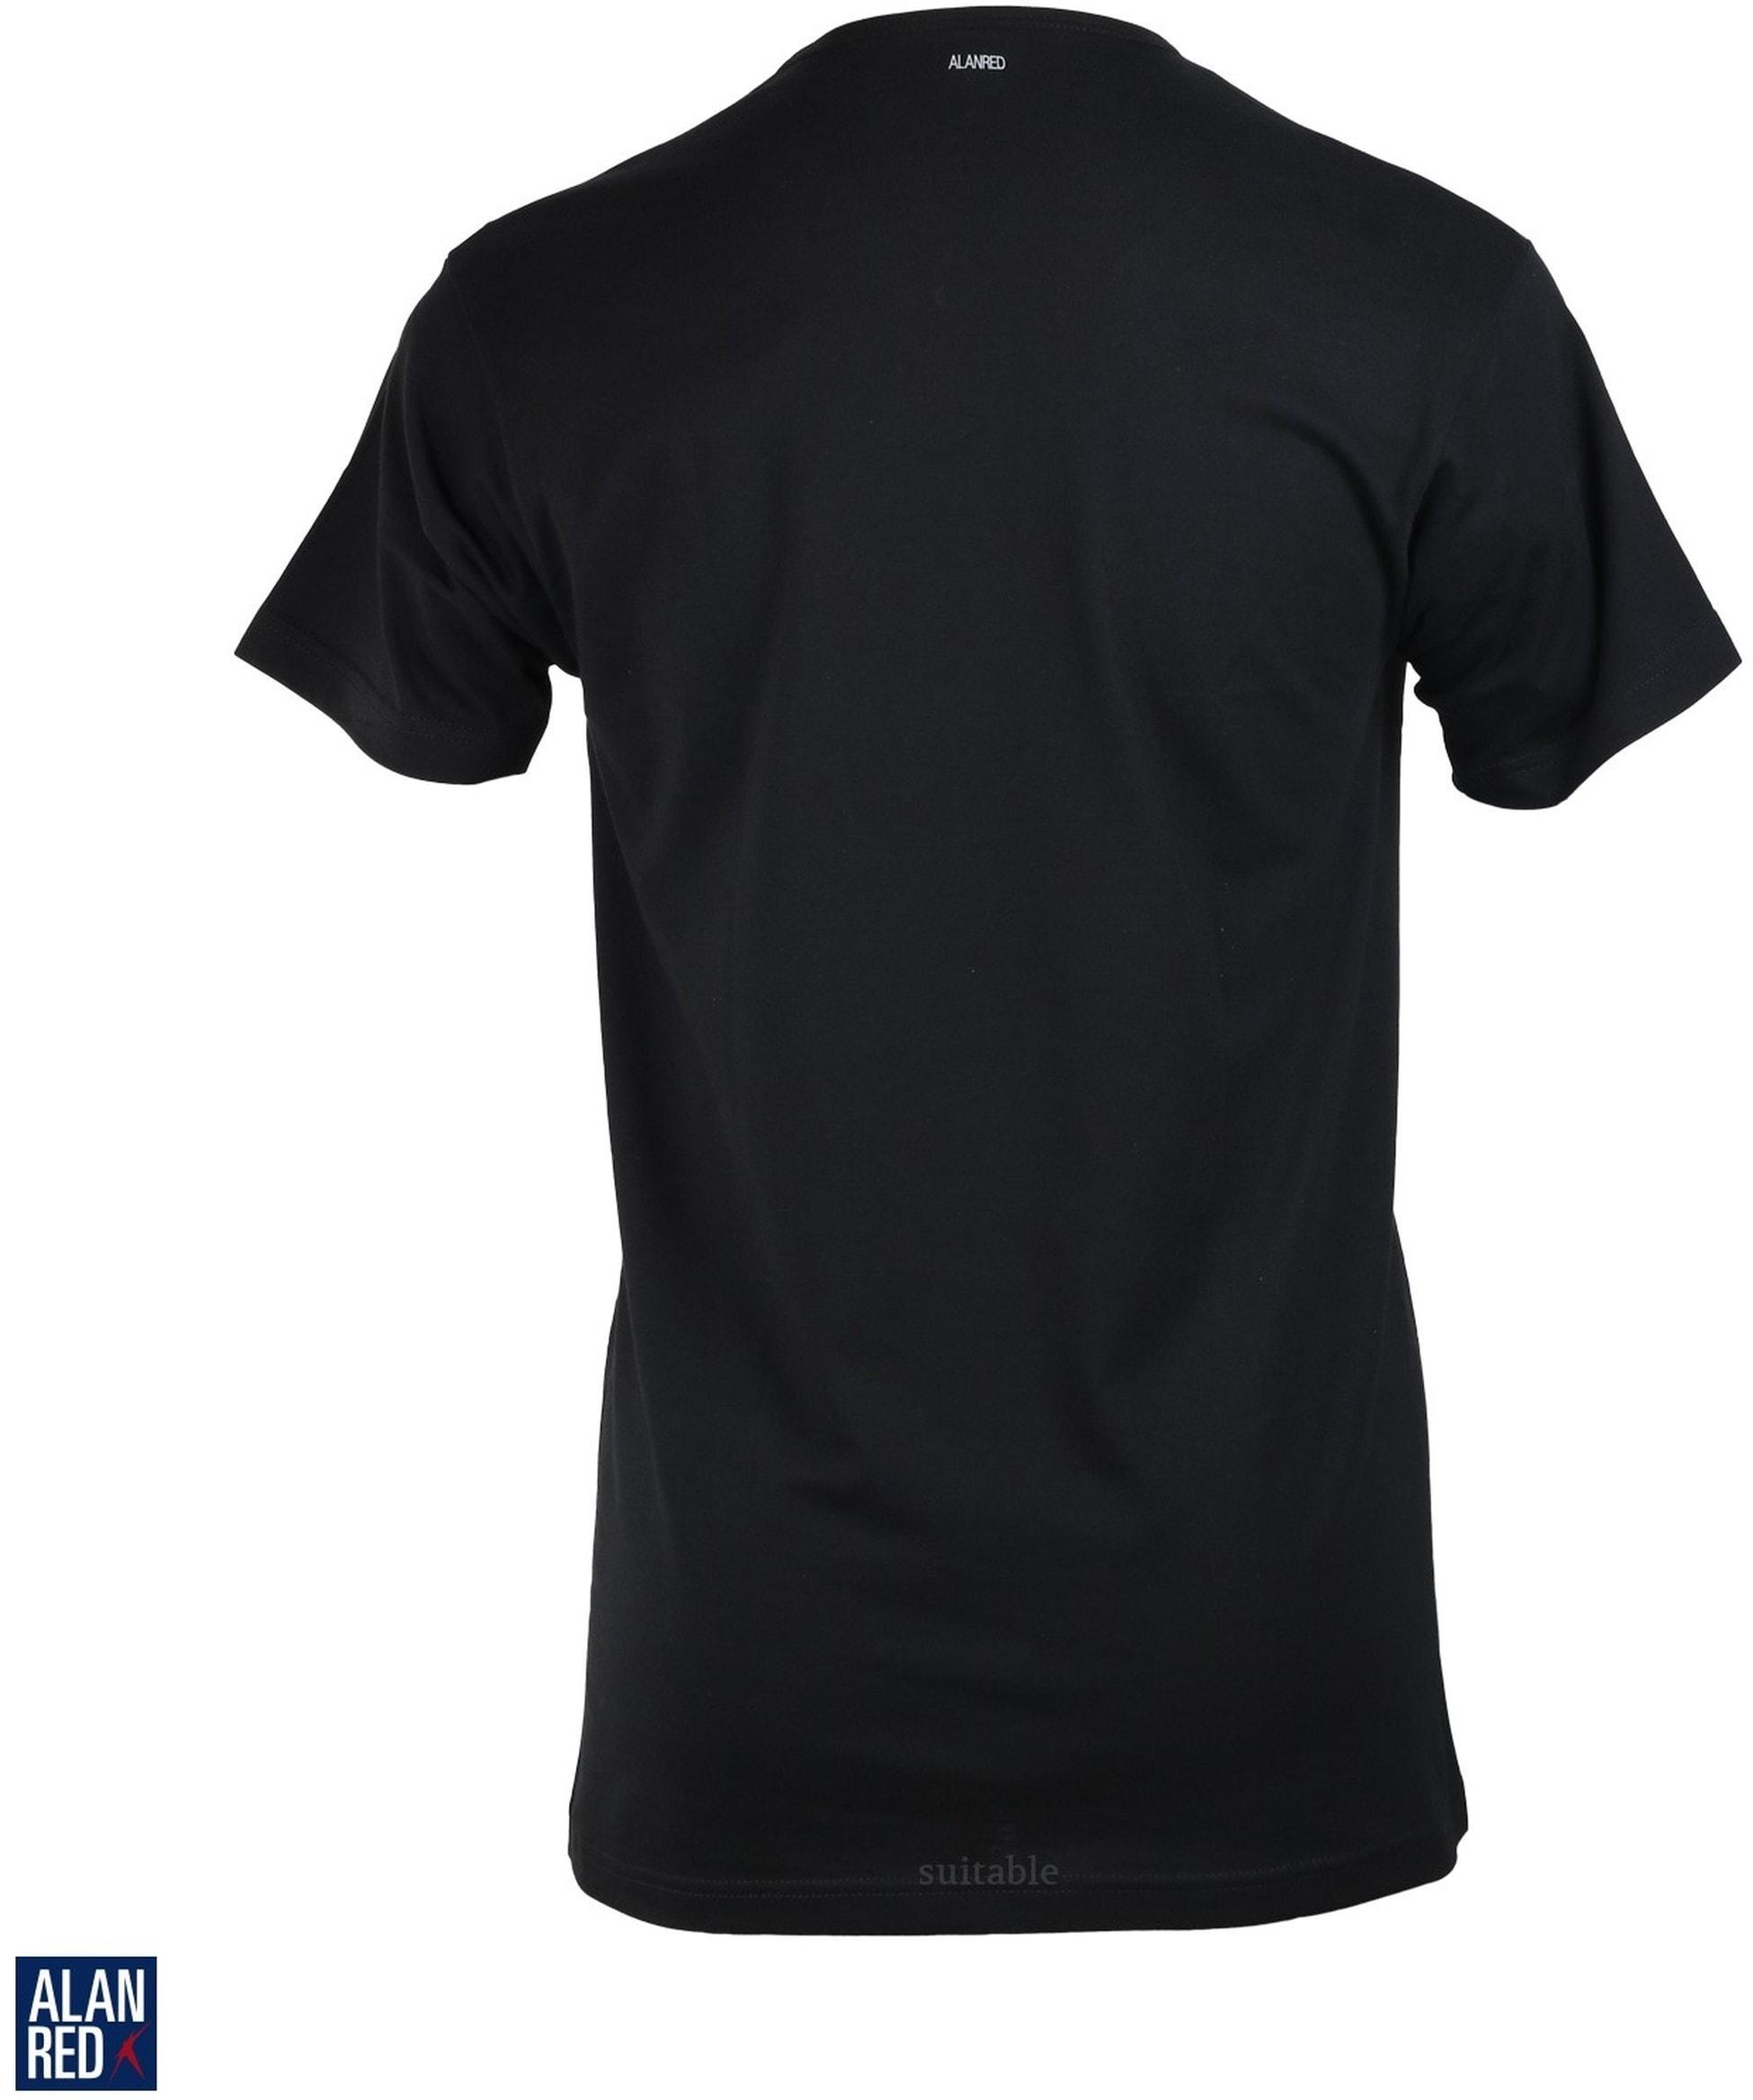 Alan Red Vermont T-Shirt V-Hals Zwart (1Pack) foto 1